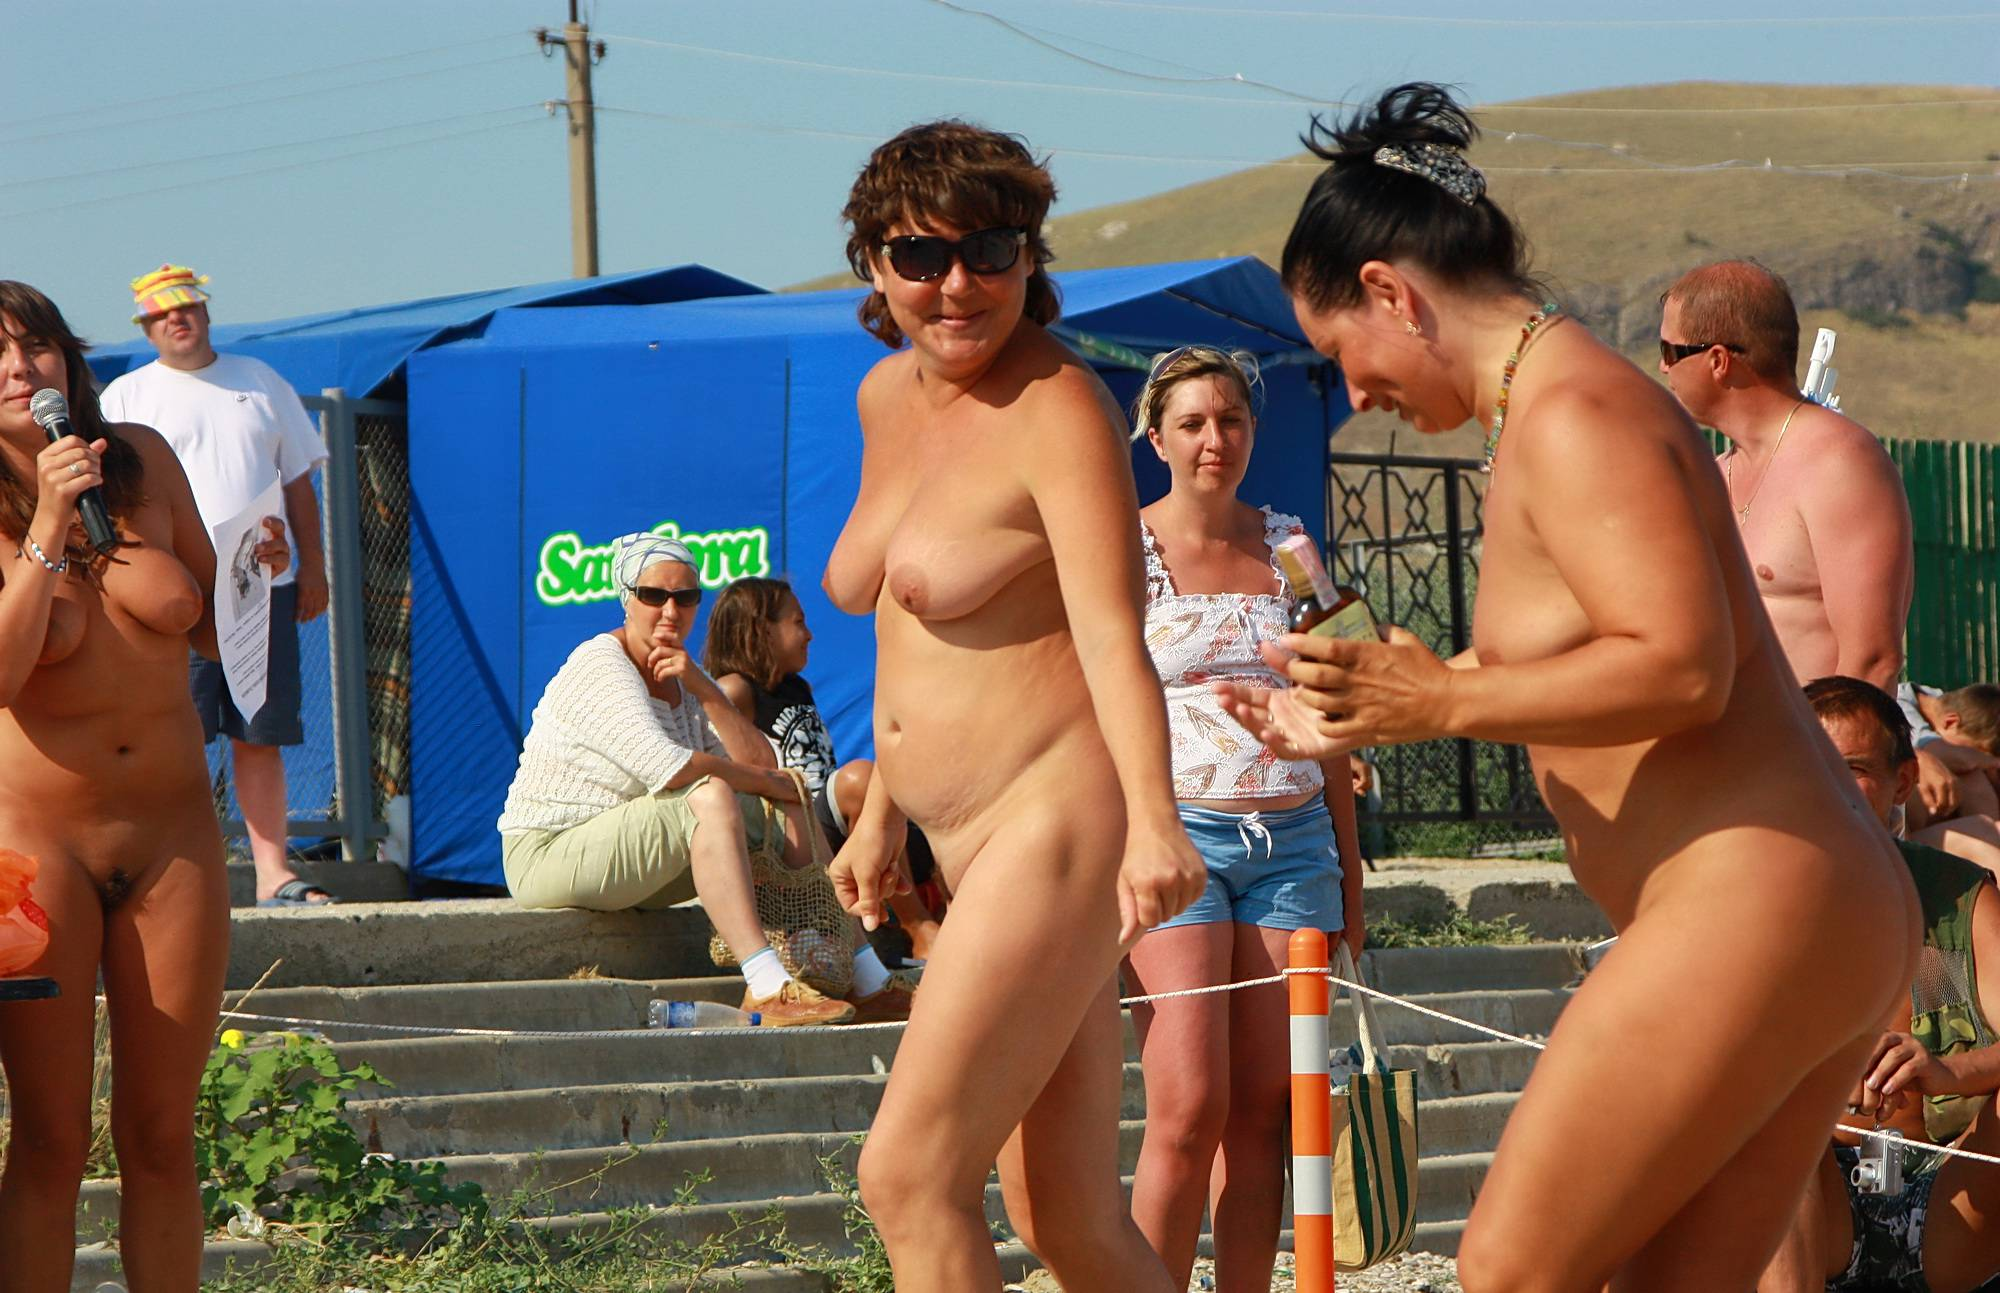 Pure Nudism Images-Naturist Beach Contest - 2